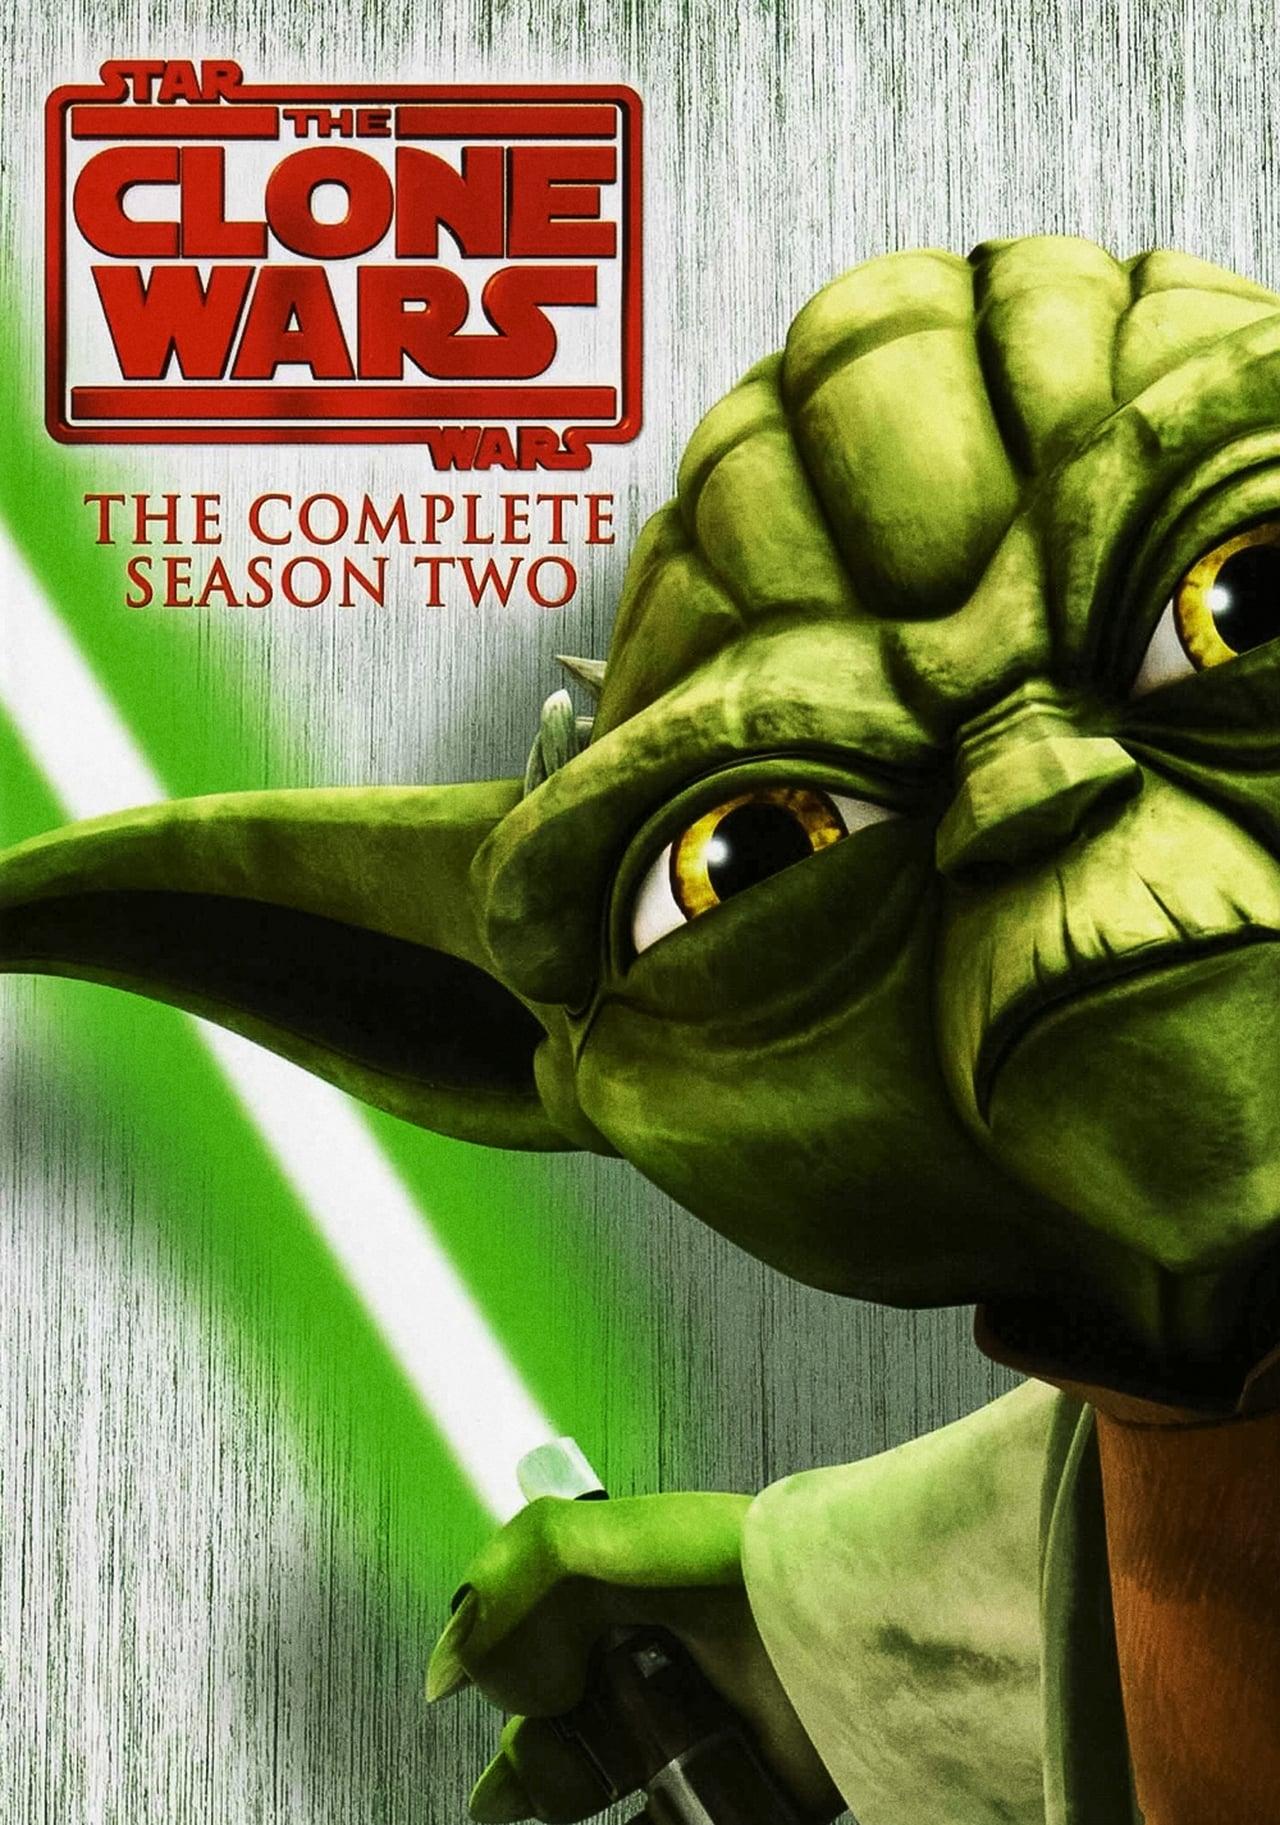 Star Wars: The Clone Wars (2009)